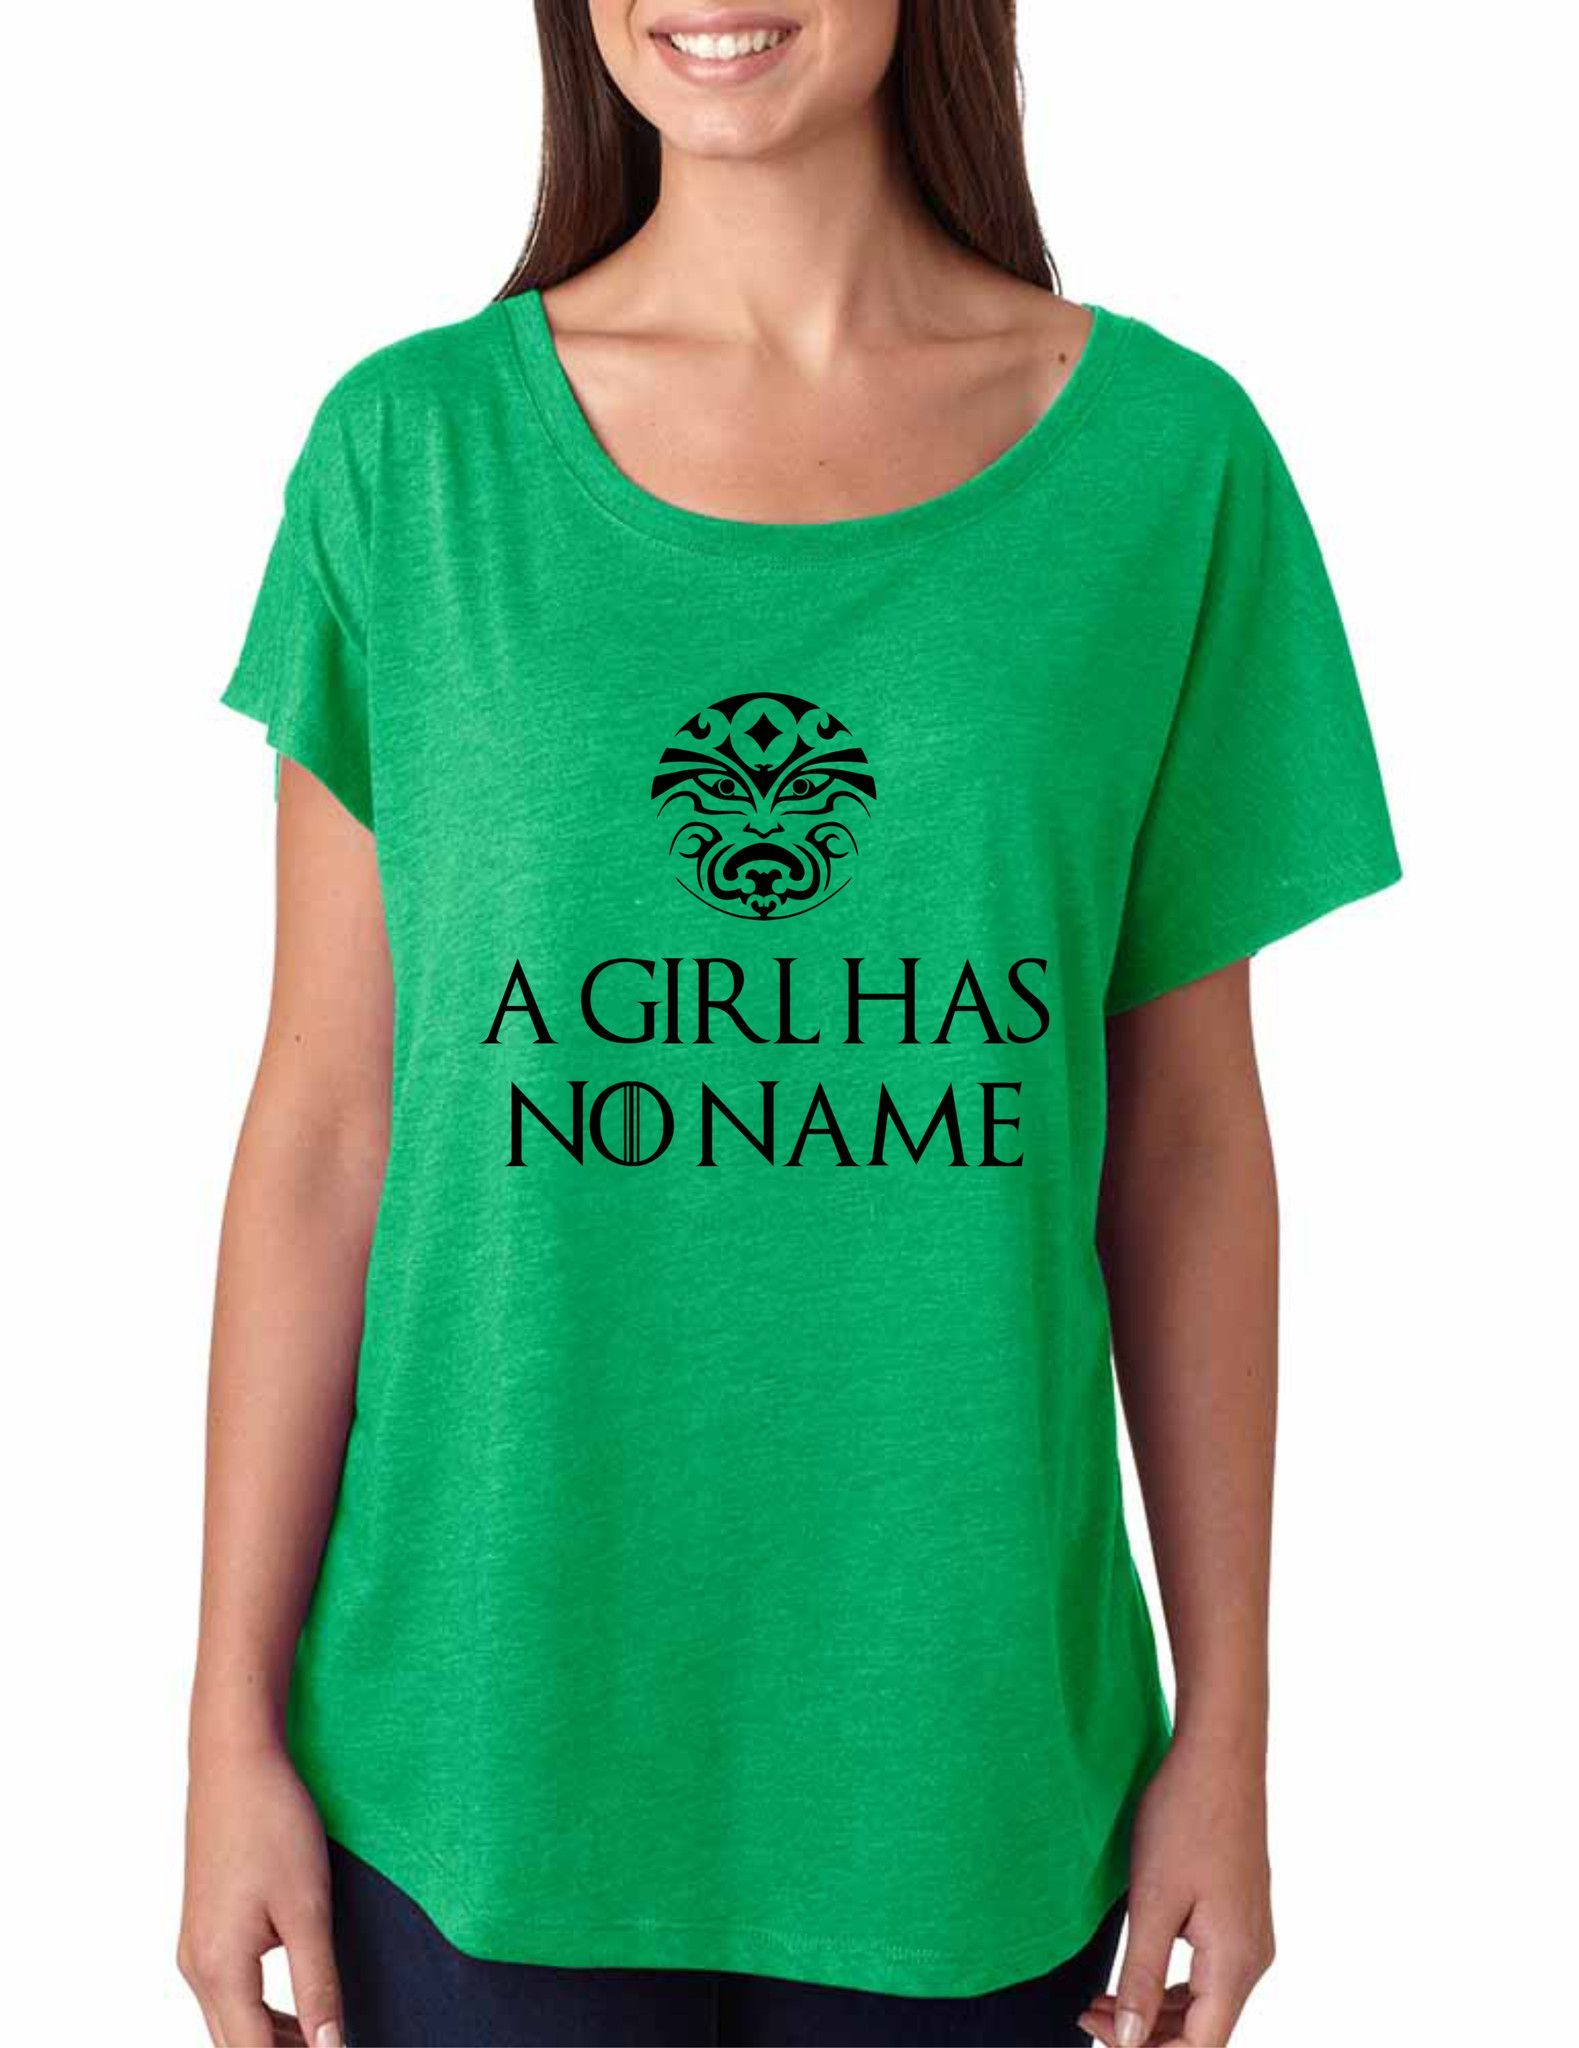 853810d2f A Girl Has No Name women tri-blend dolman shirt | Products | Shirts ...